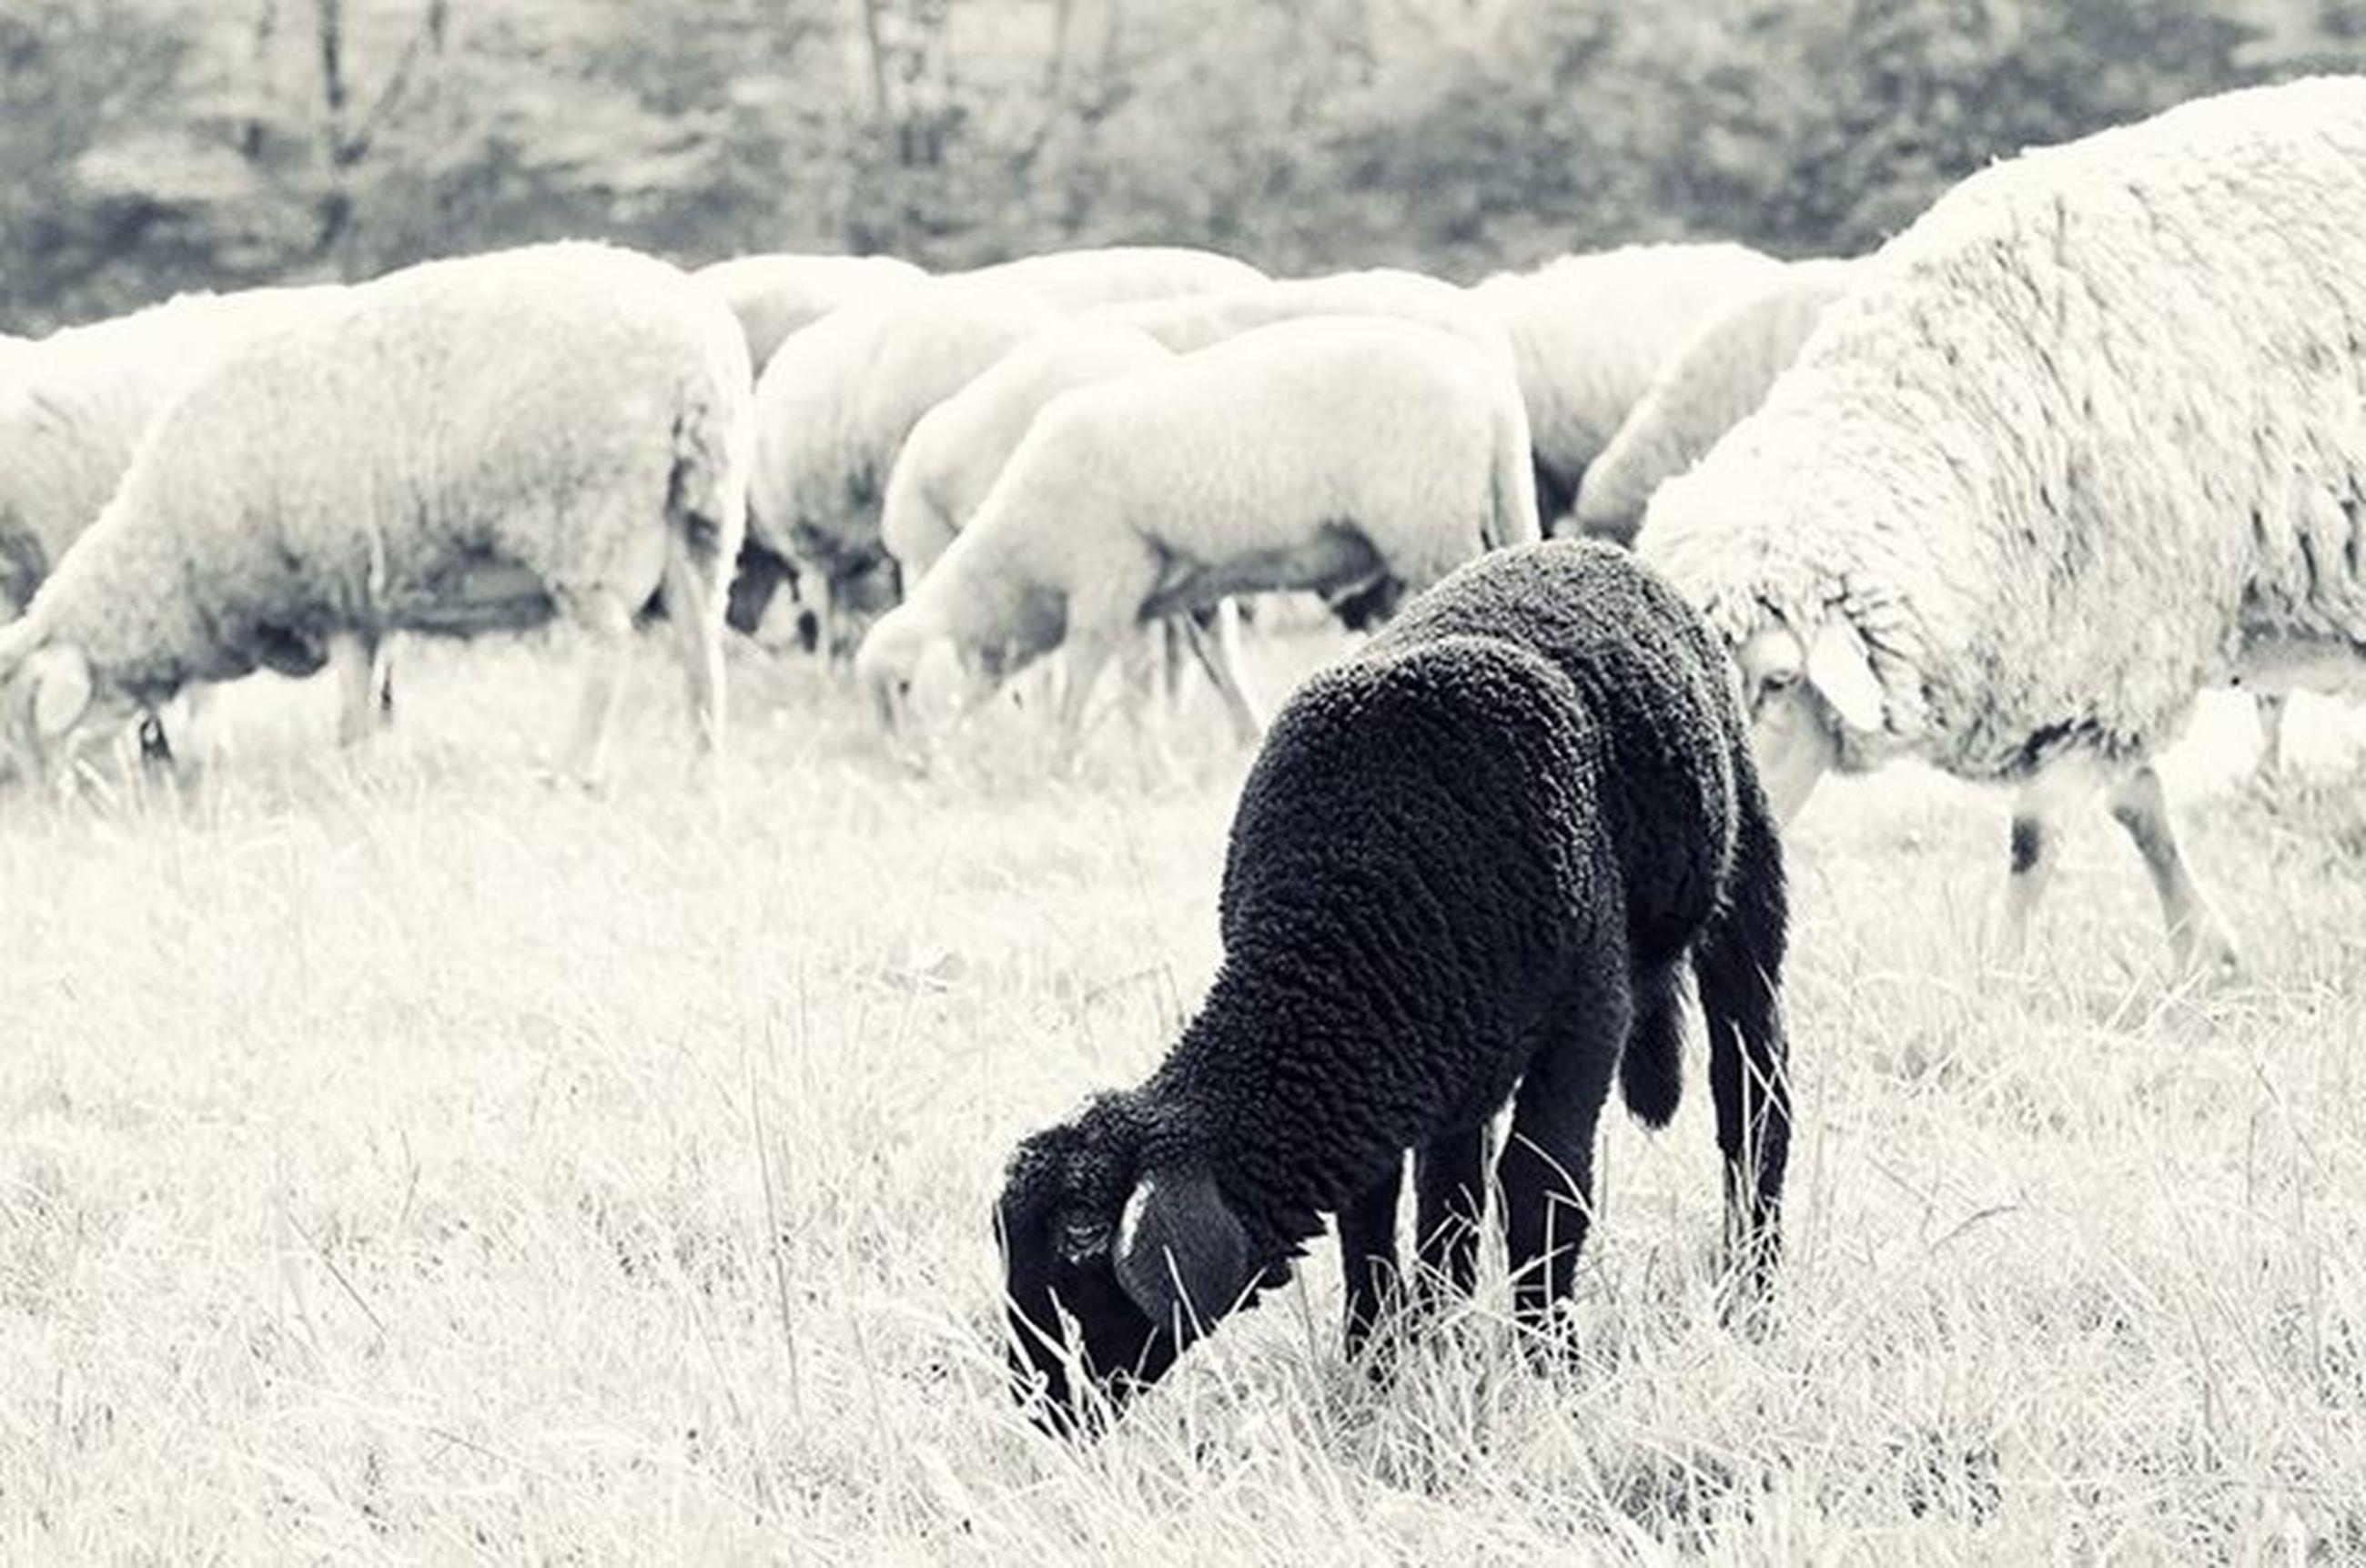 animal themes, field, mammal, livestock, safari animals, herbivorous, grazing, standing, domestic animals, two animals, nature, herd, animals in the wild, wildlife, landscape, zebra, elephant, grass, animal family